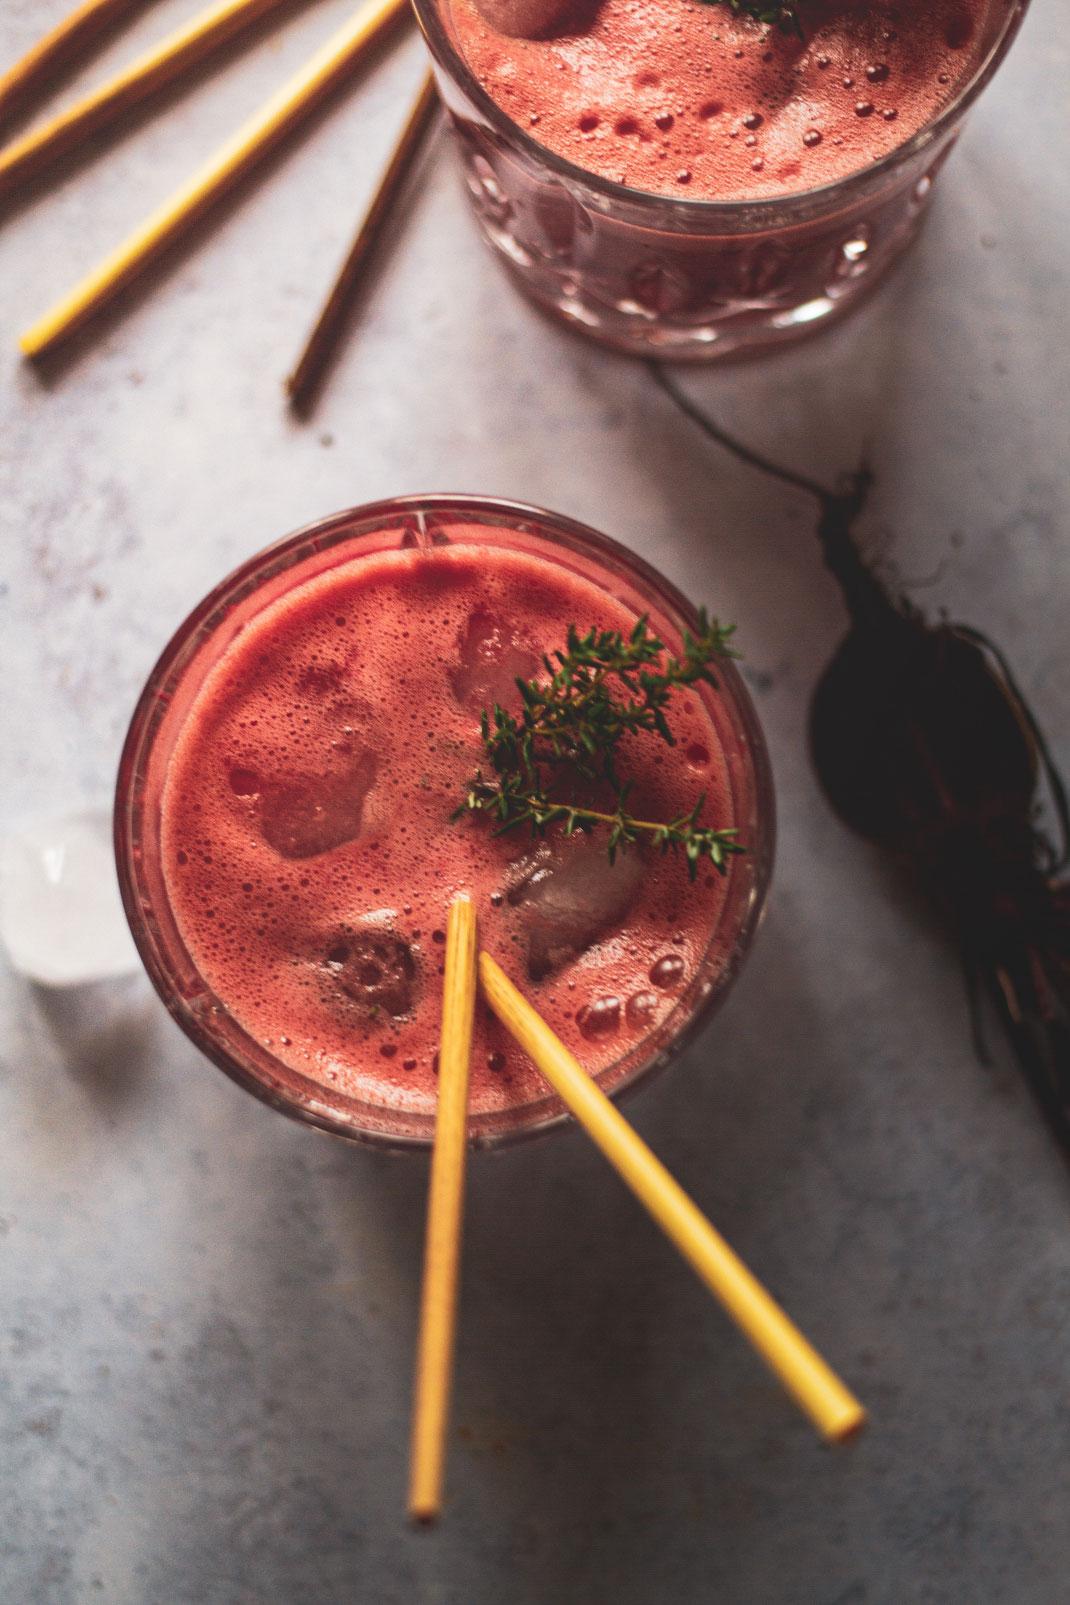 Rote Beete Drink mit Gin - Botanical Cocktail